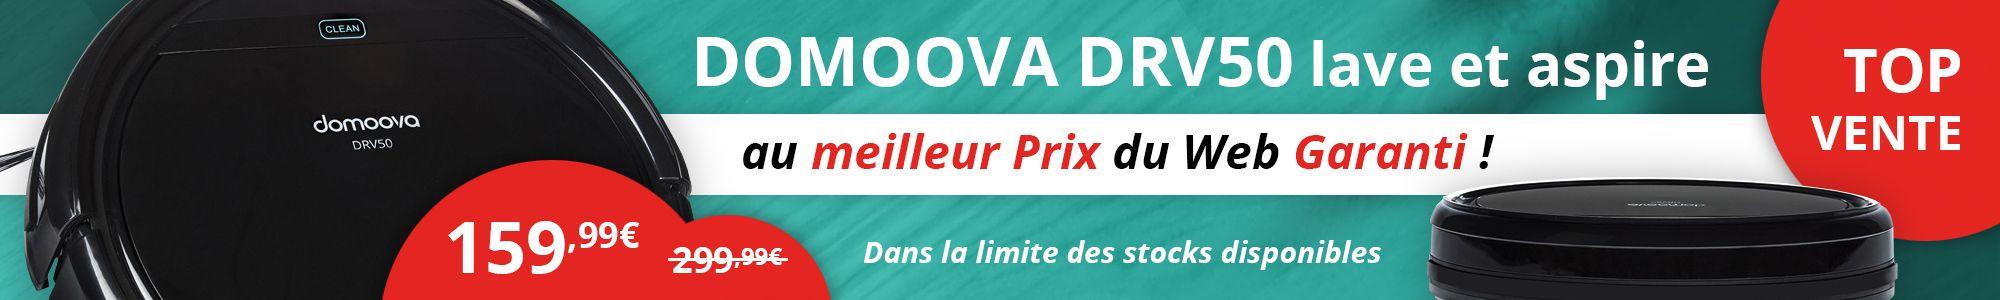 Domoova DRV50 au meilleur prix web garanti!